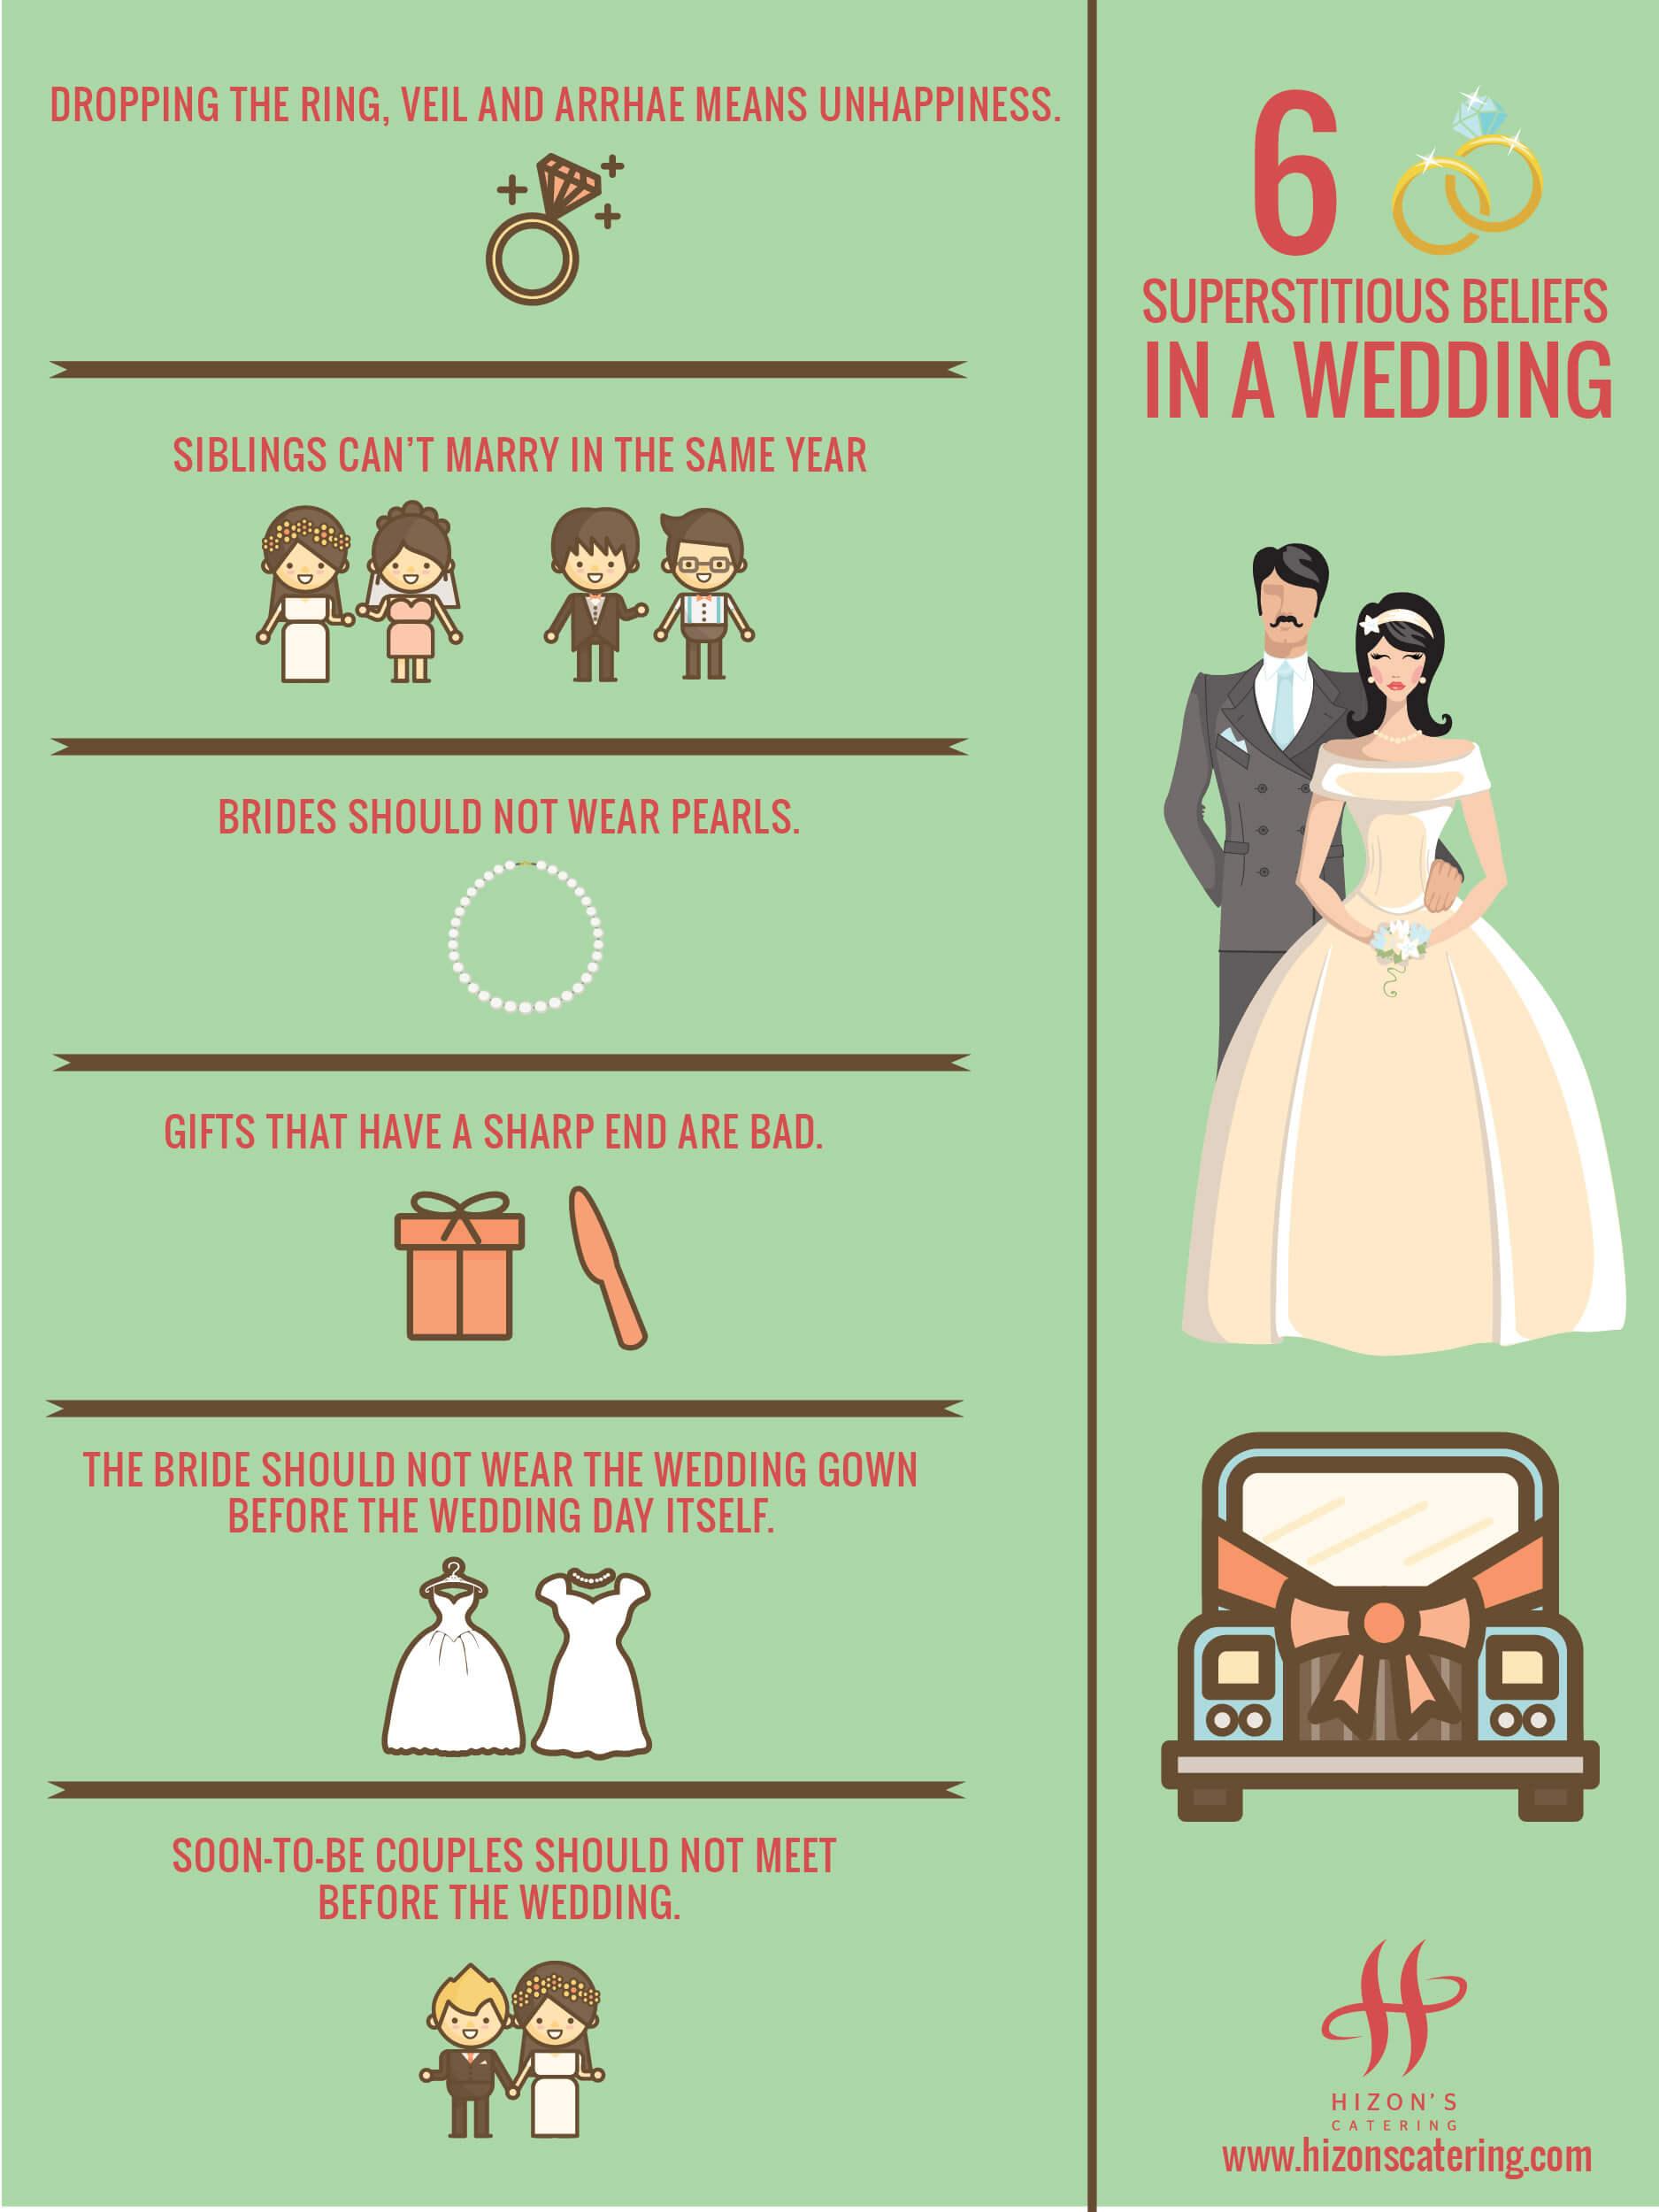 hizons catering wedding superstitious beliefs